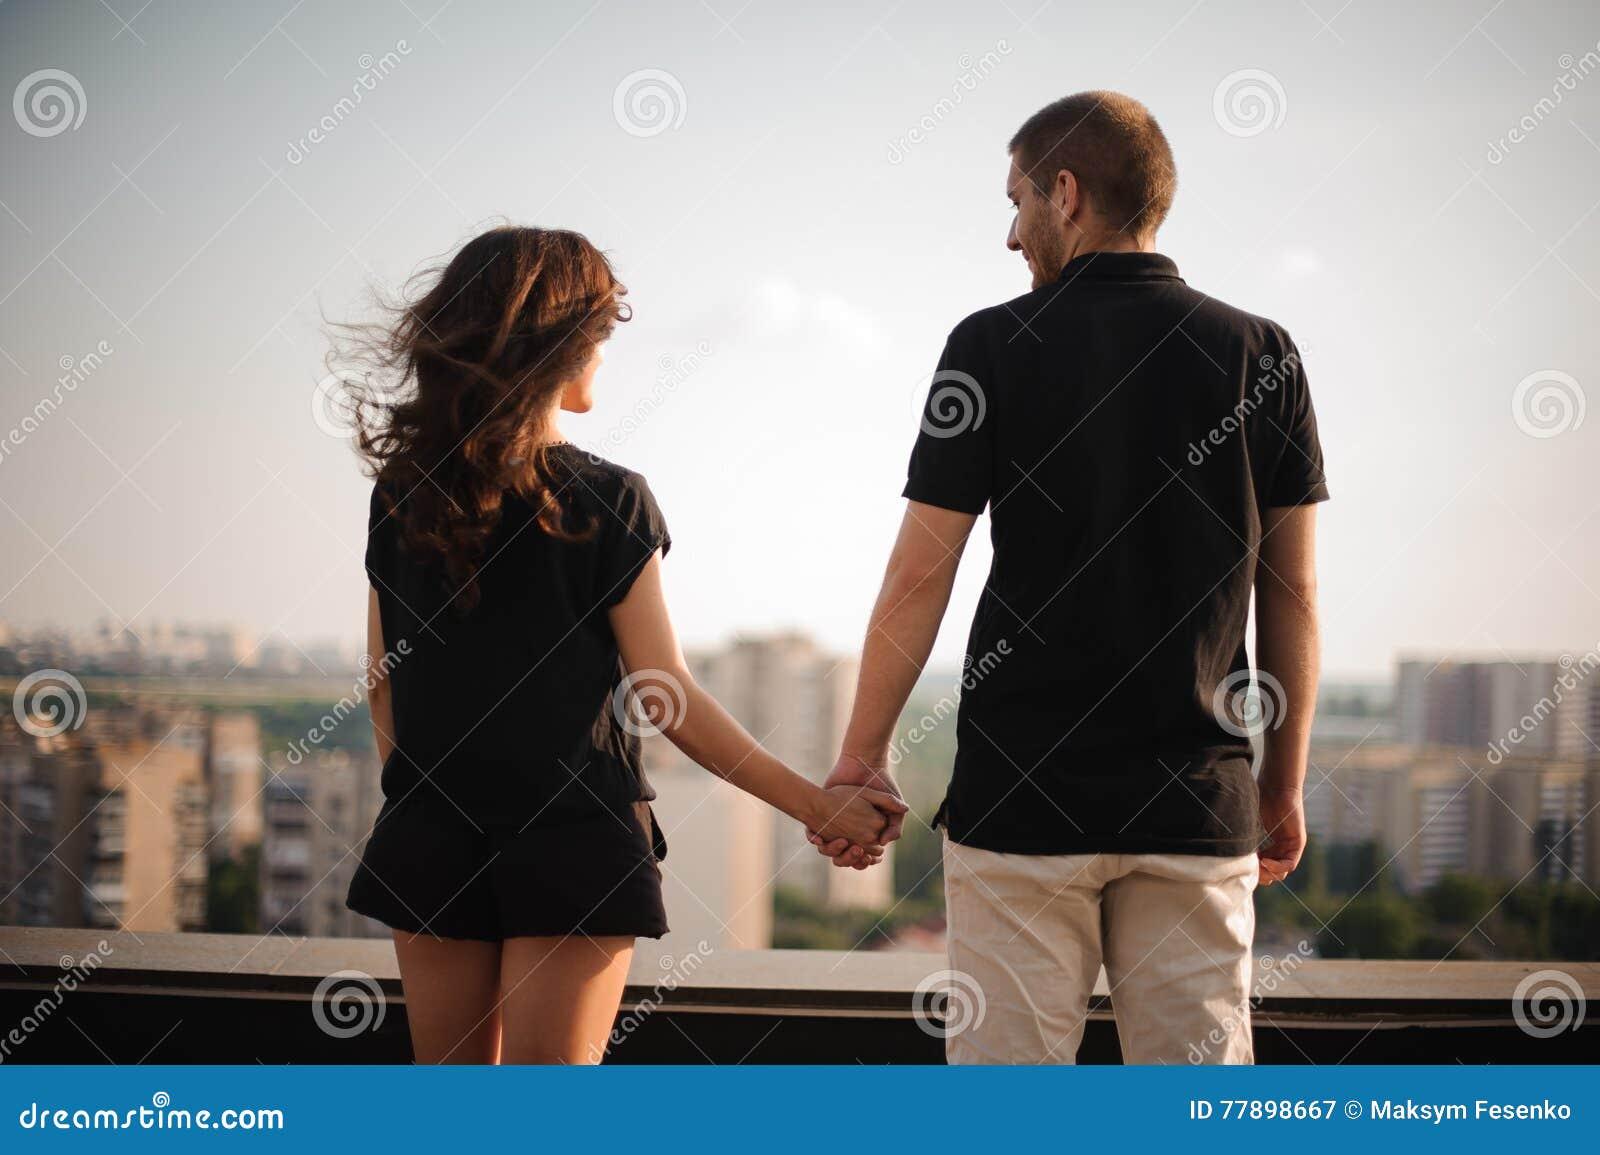 St σύννεφο dating υπερσεξουαλικότητα χρονολογίων